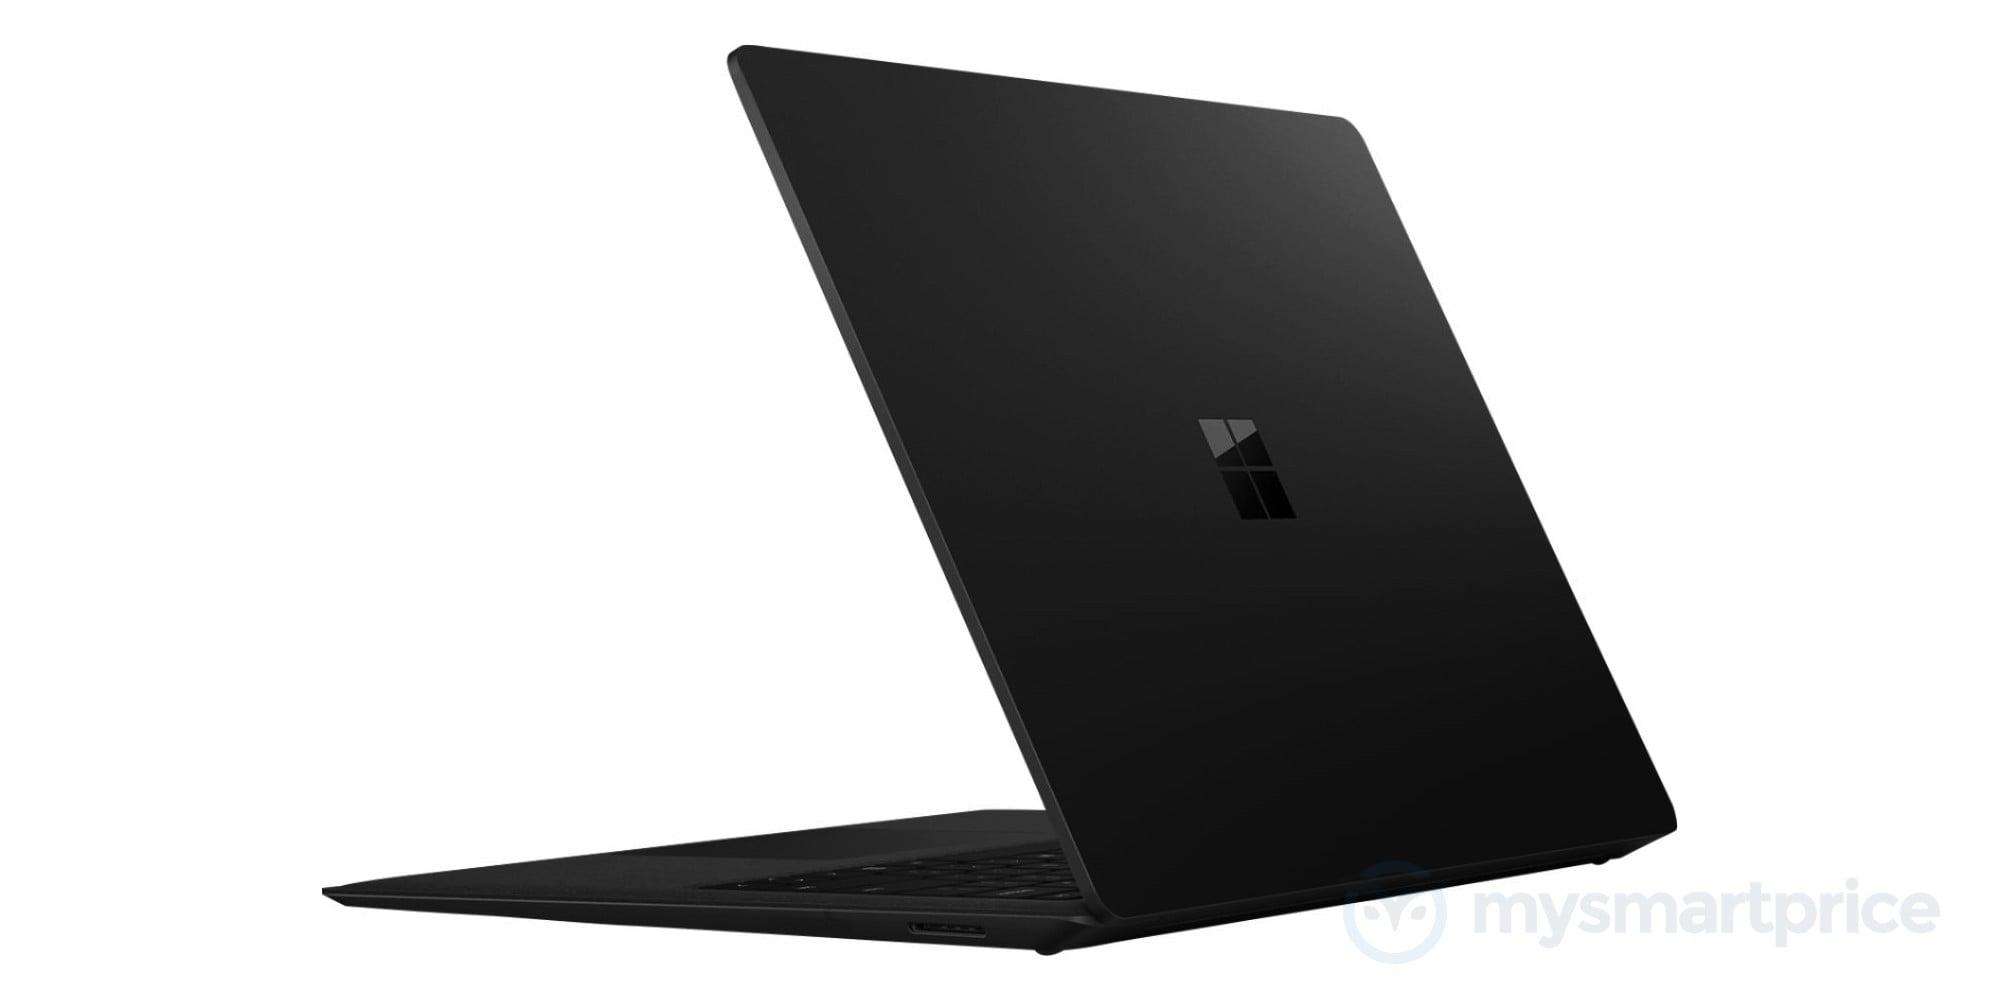 - Hverken Surface Laptop 2 eller Surface Pro 6 har USB-C.